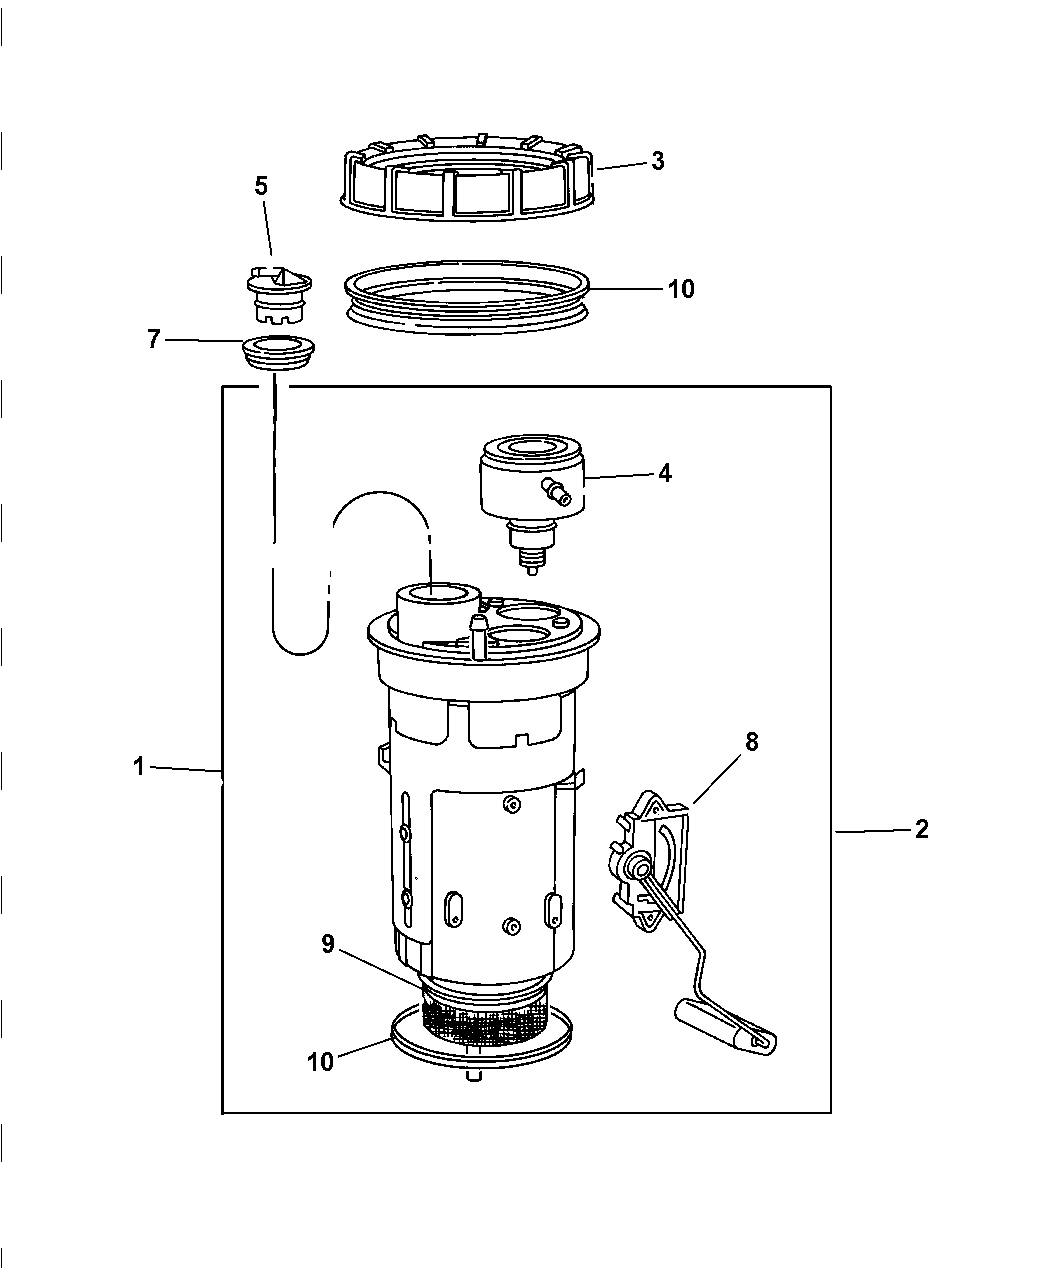 2001 Dodge Ram 1500 Fuel Pump